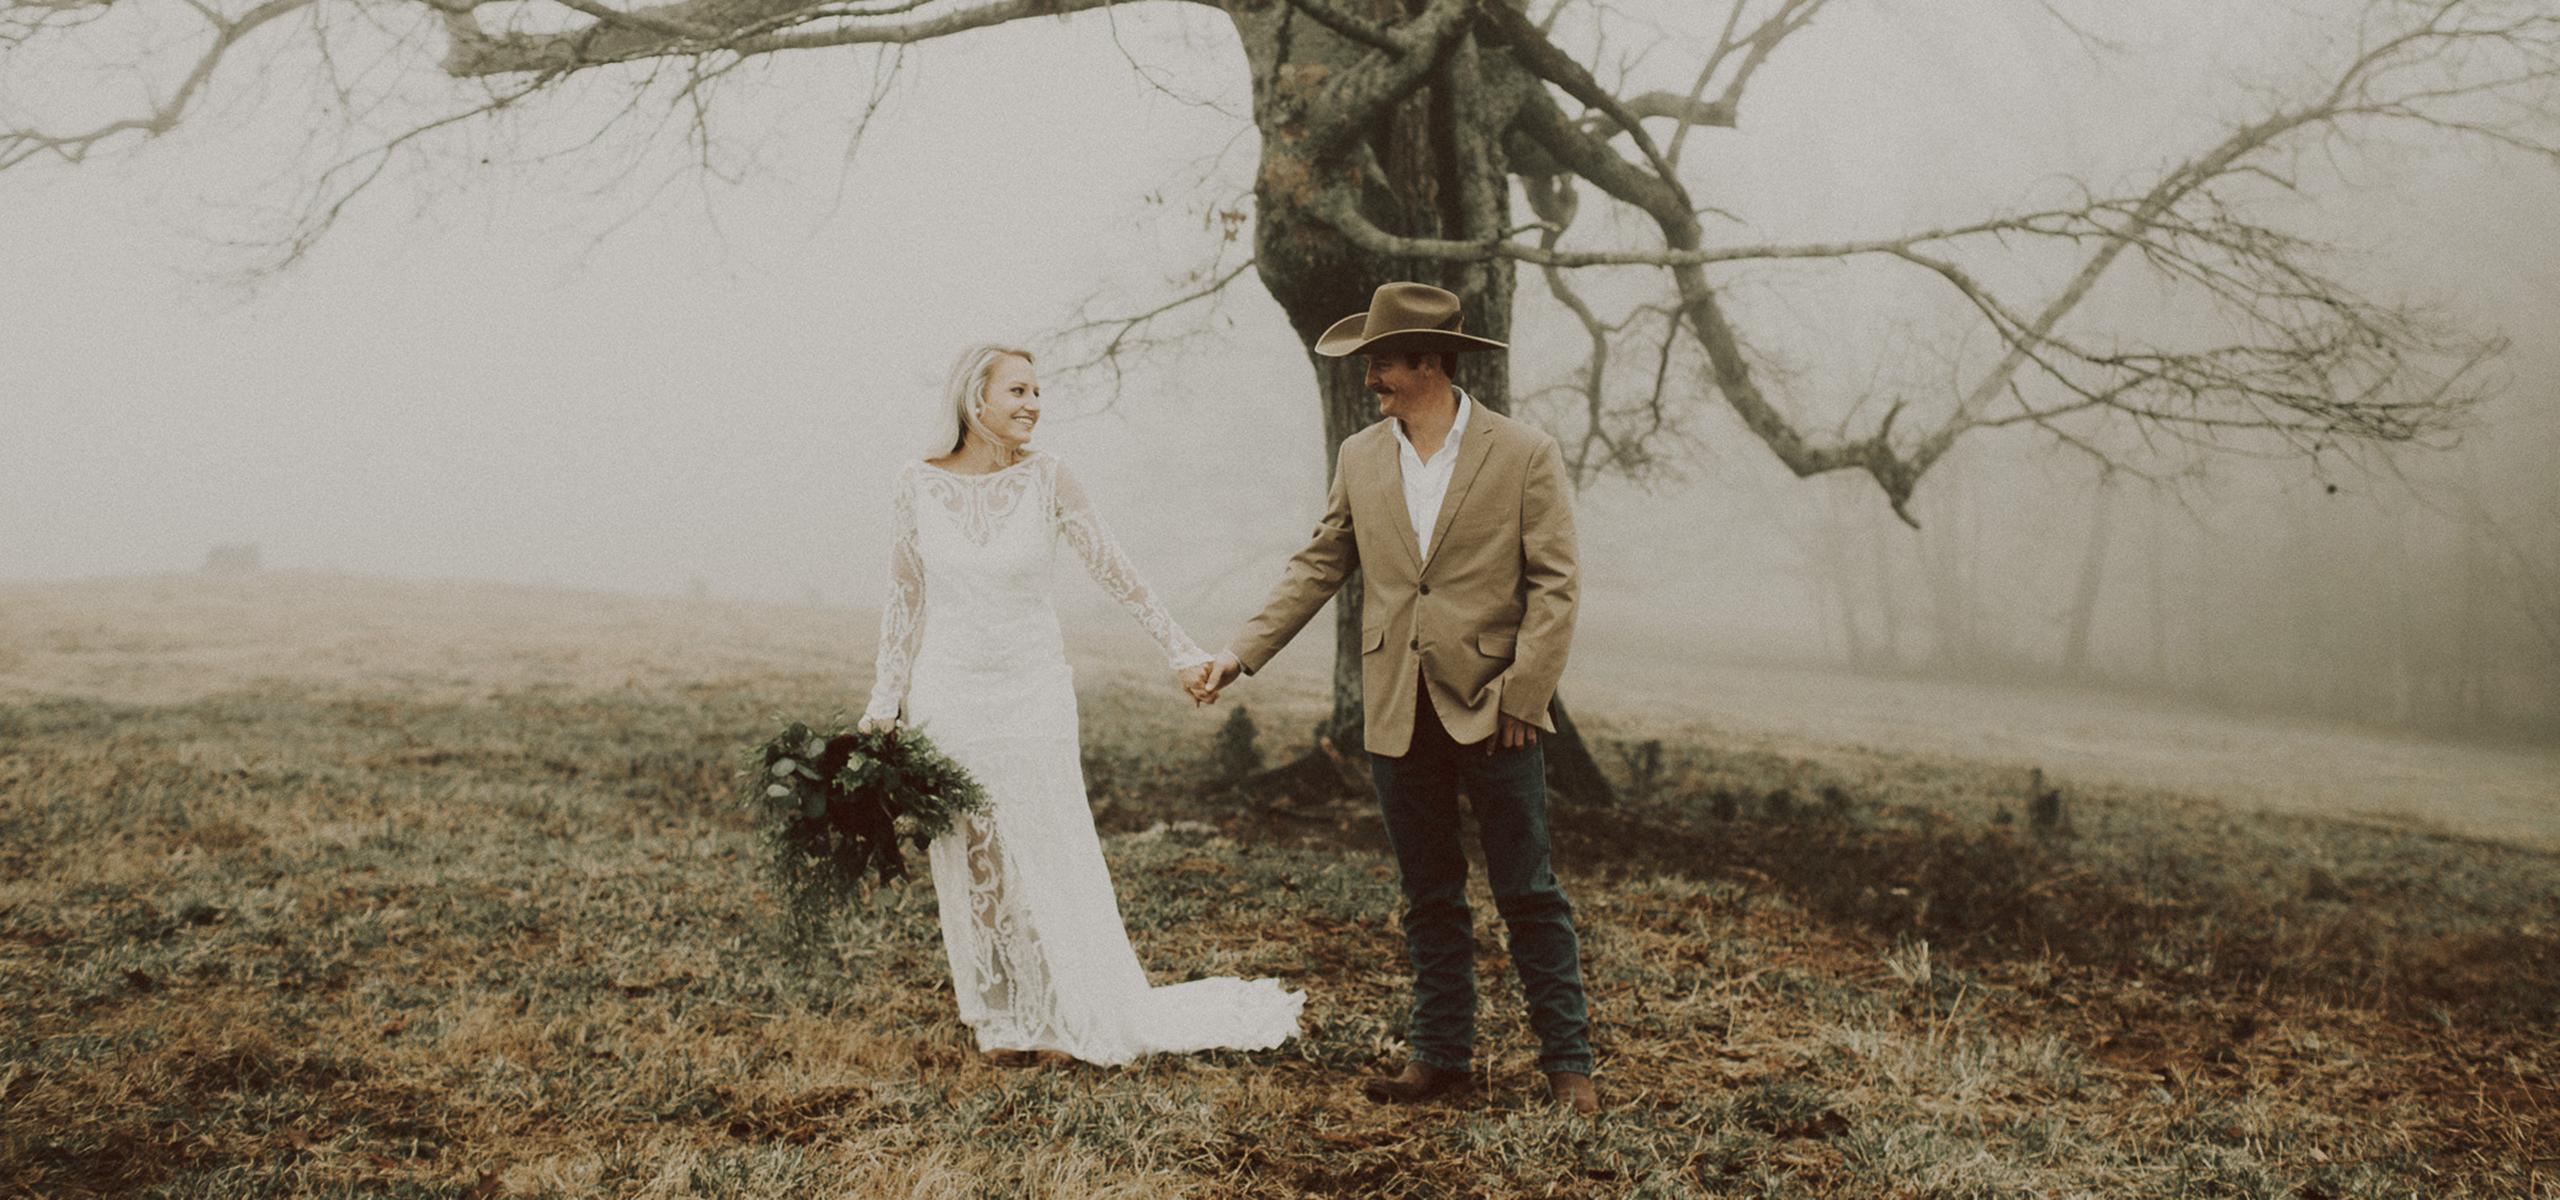 Helen Georgia Wedding Photography + Elopement Photography